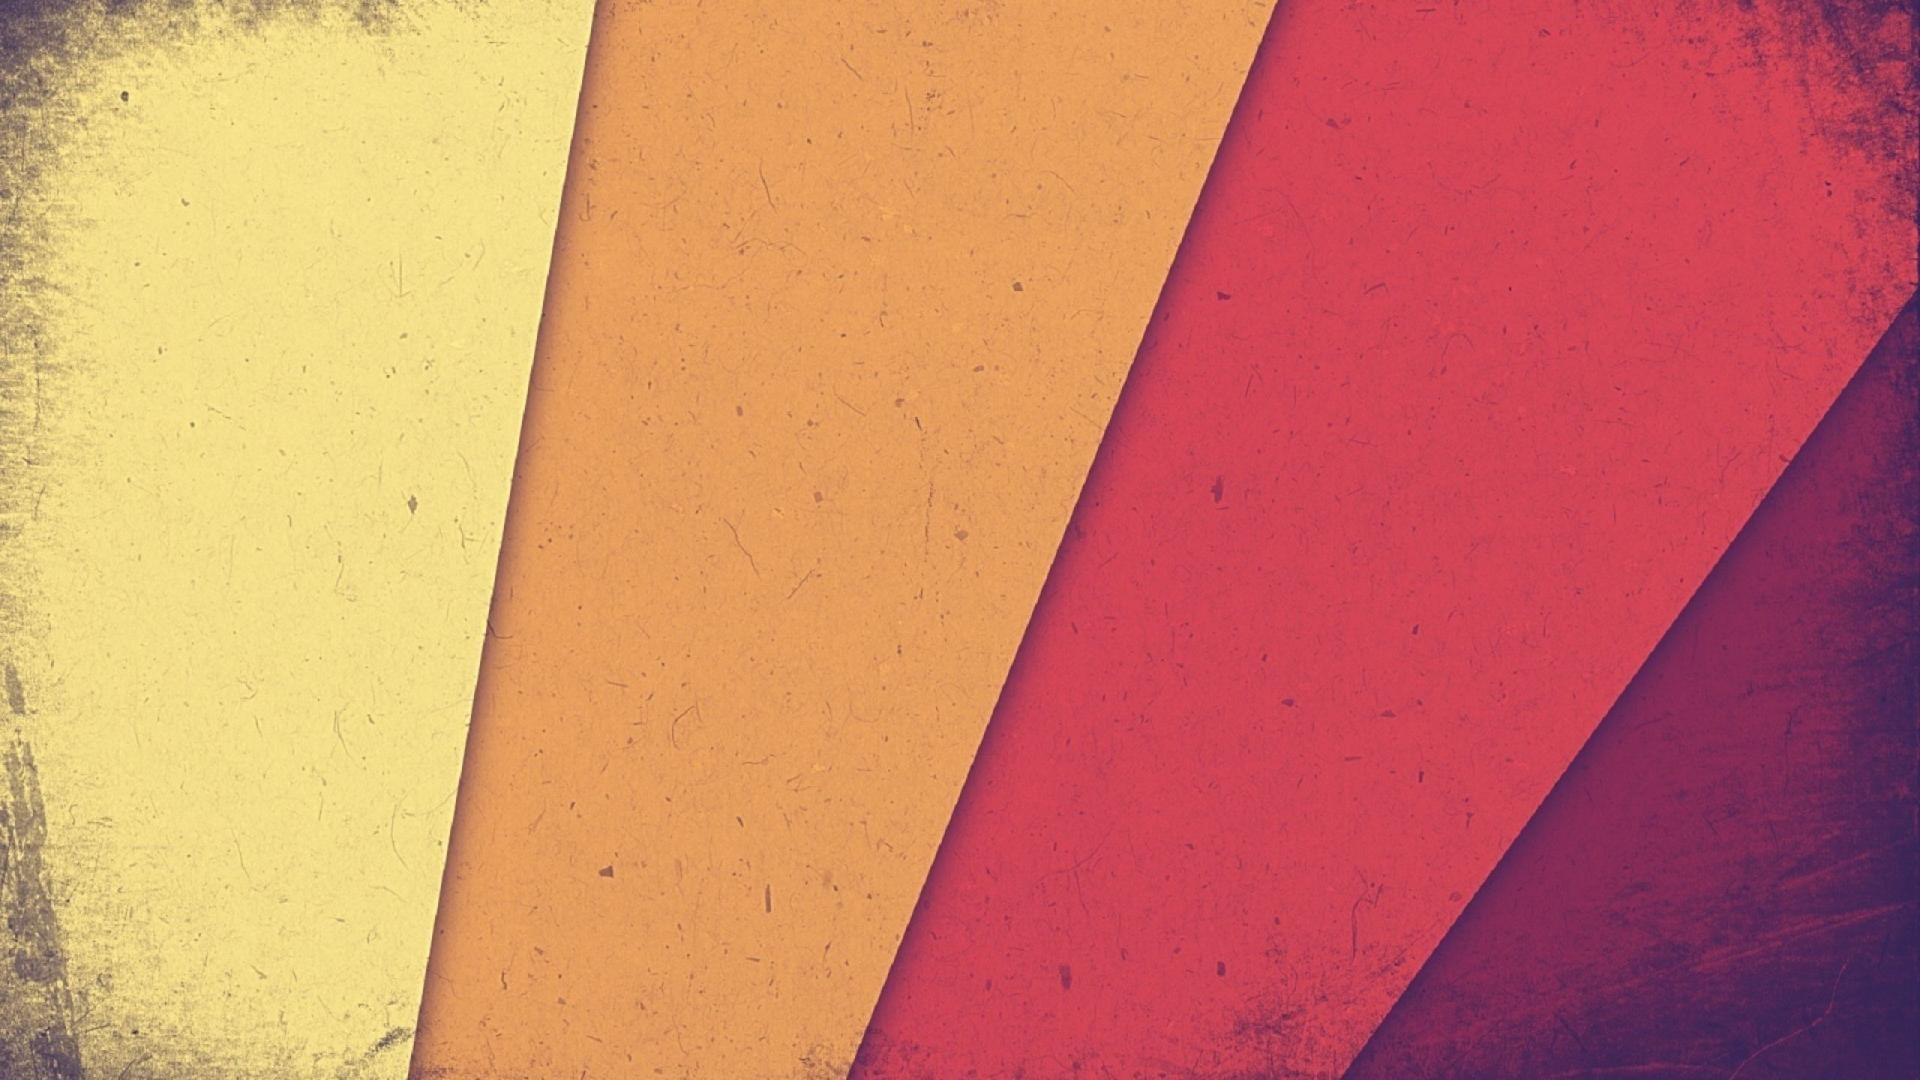 1121418 beautiful vintage desktop background 1920x1080 meizu